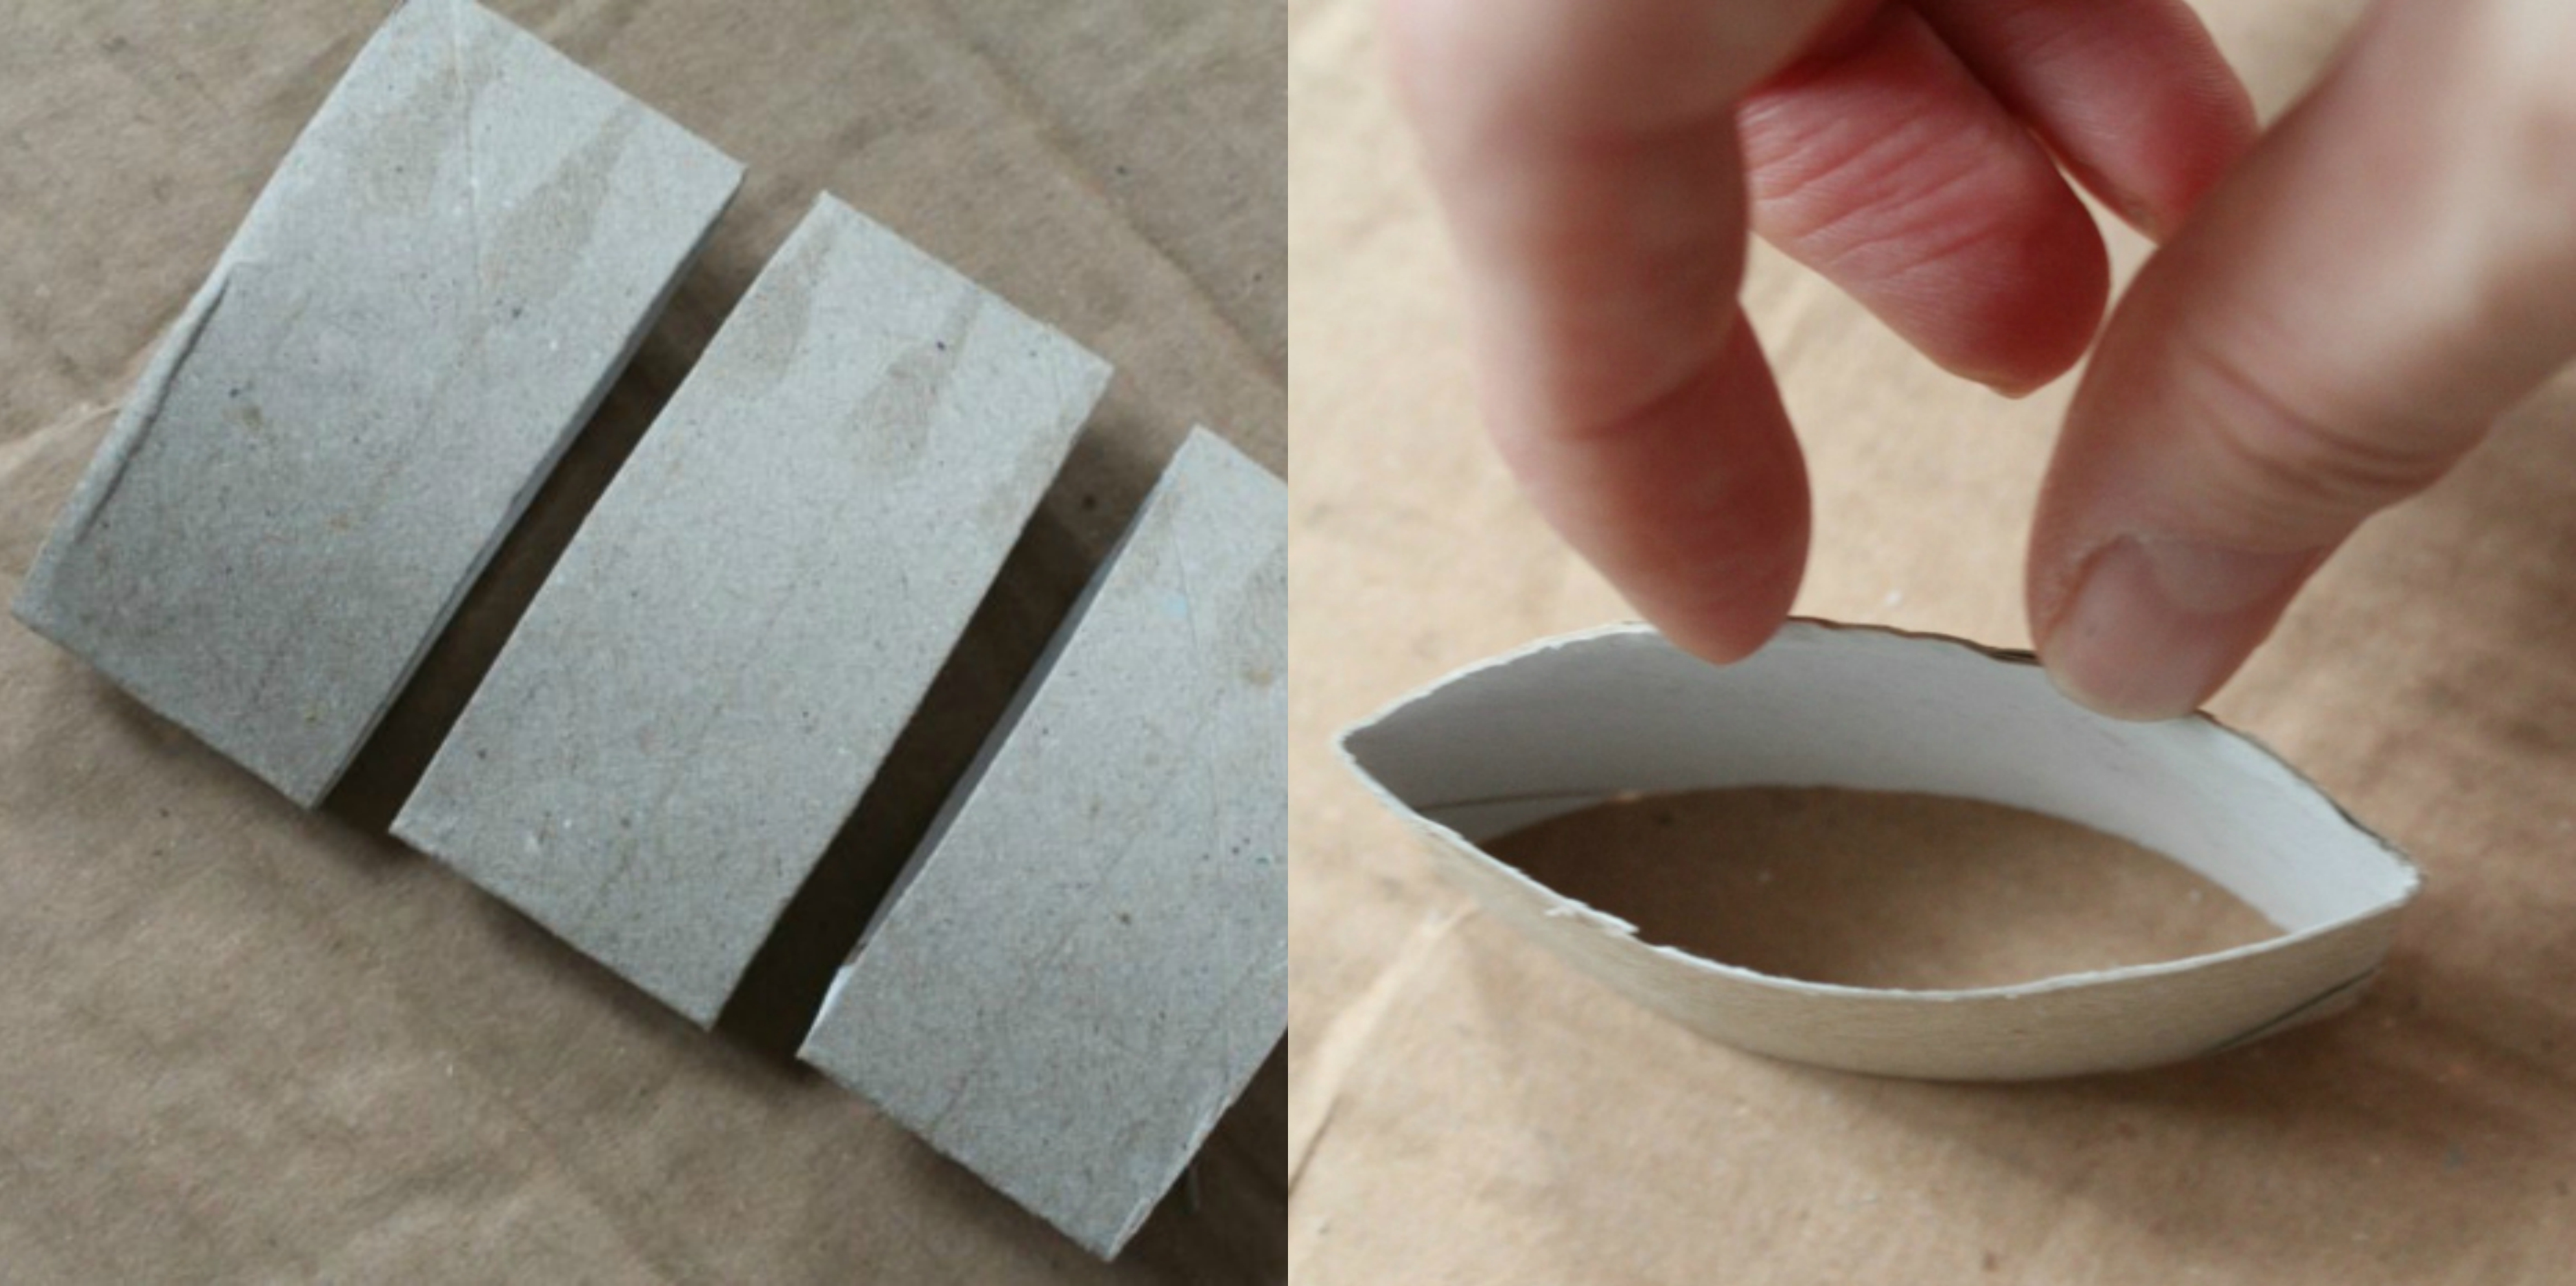 1001 ideas de manualidades con rollos de papel higi nico - Decoracion con rollos de papel higienico ...